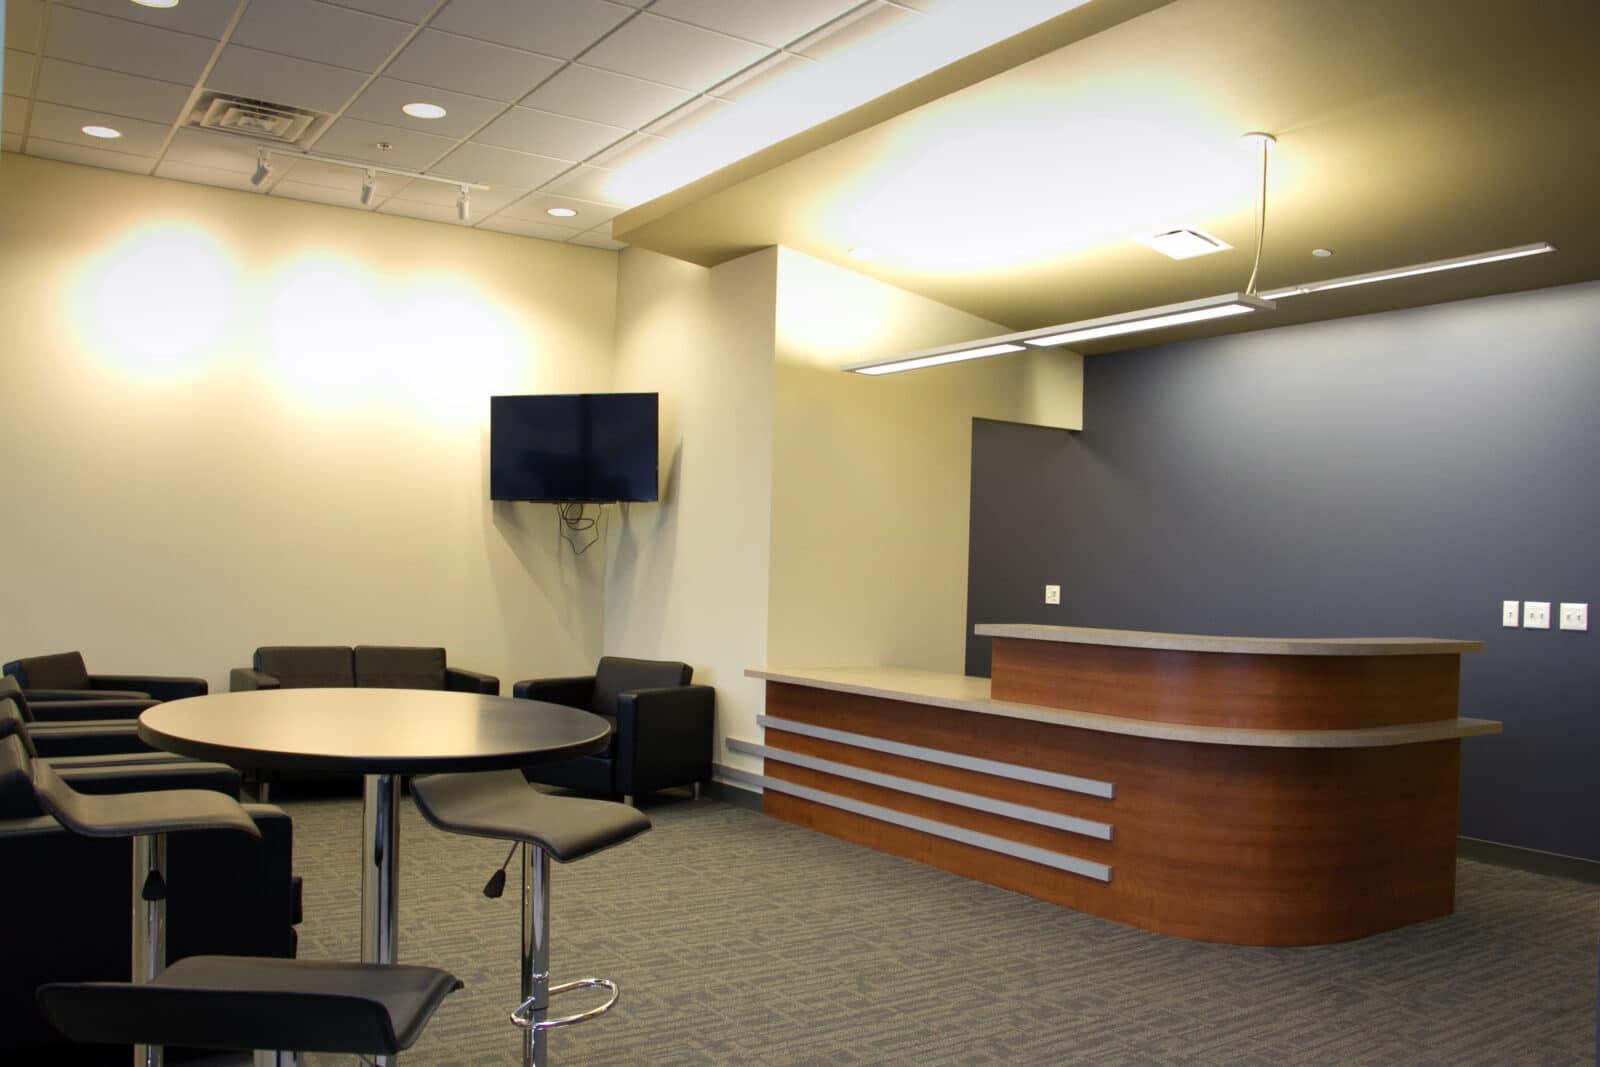 valeri orthodontics, construction management associates, general contractors